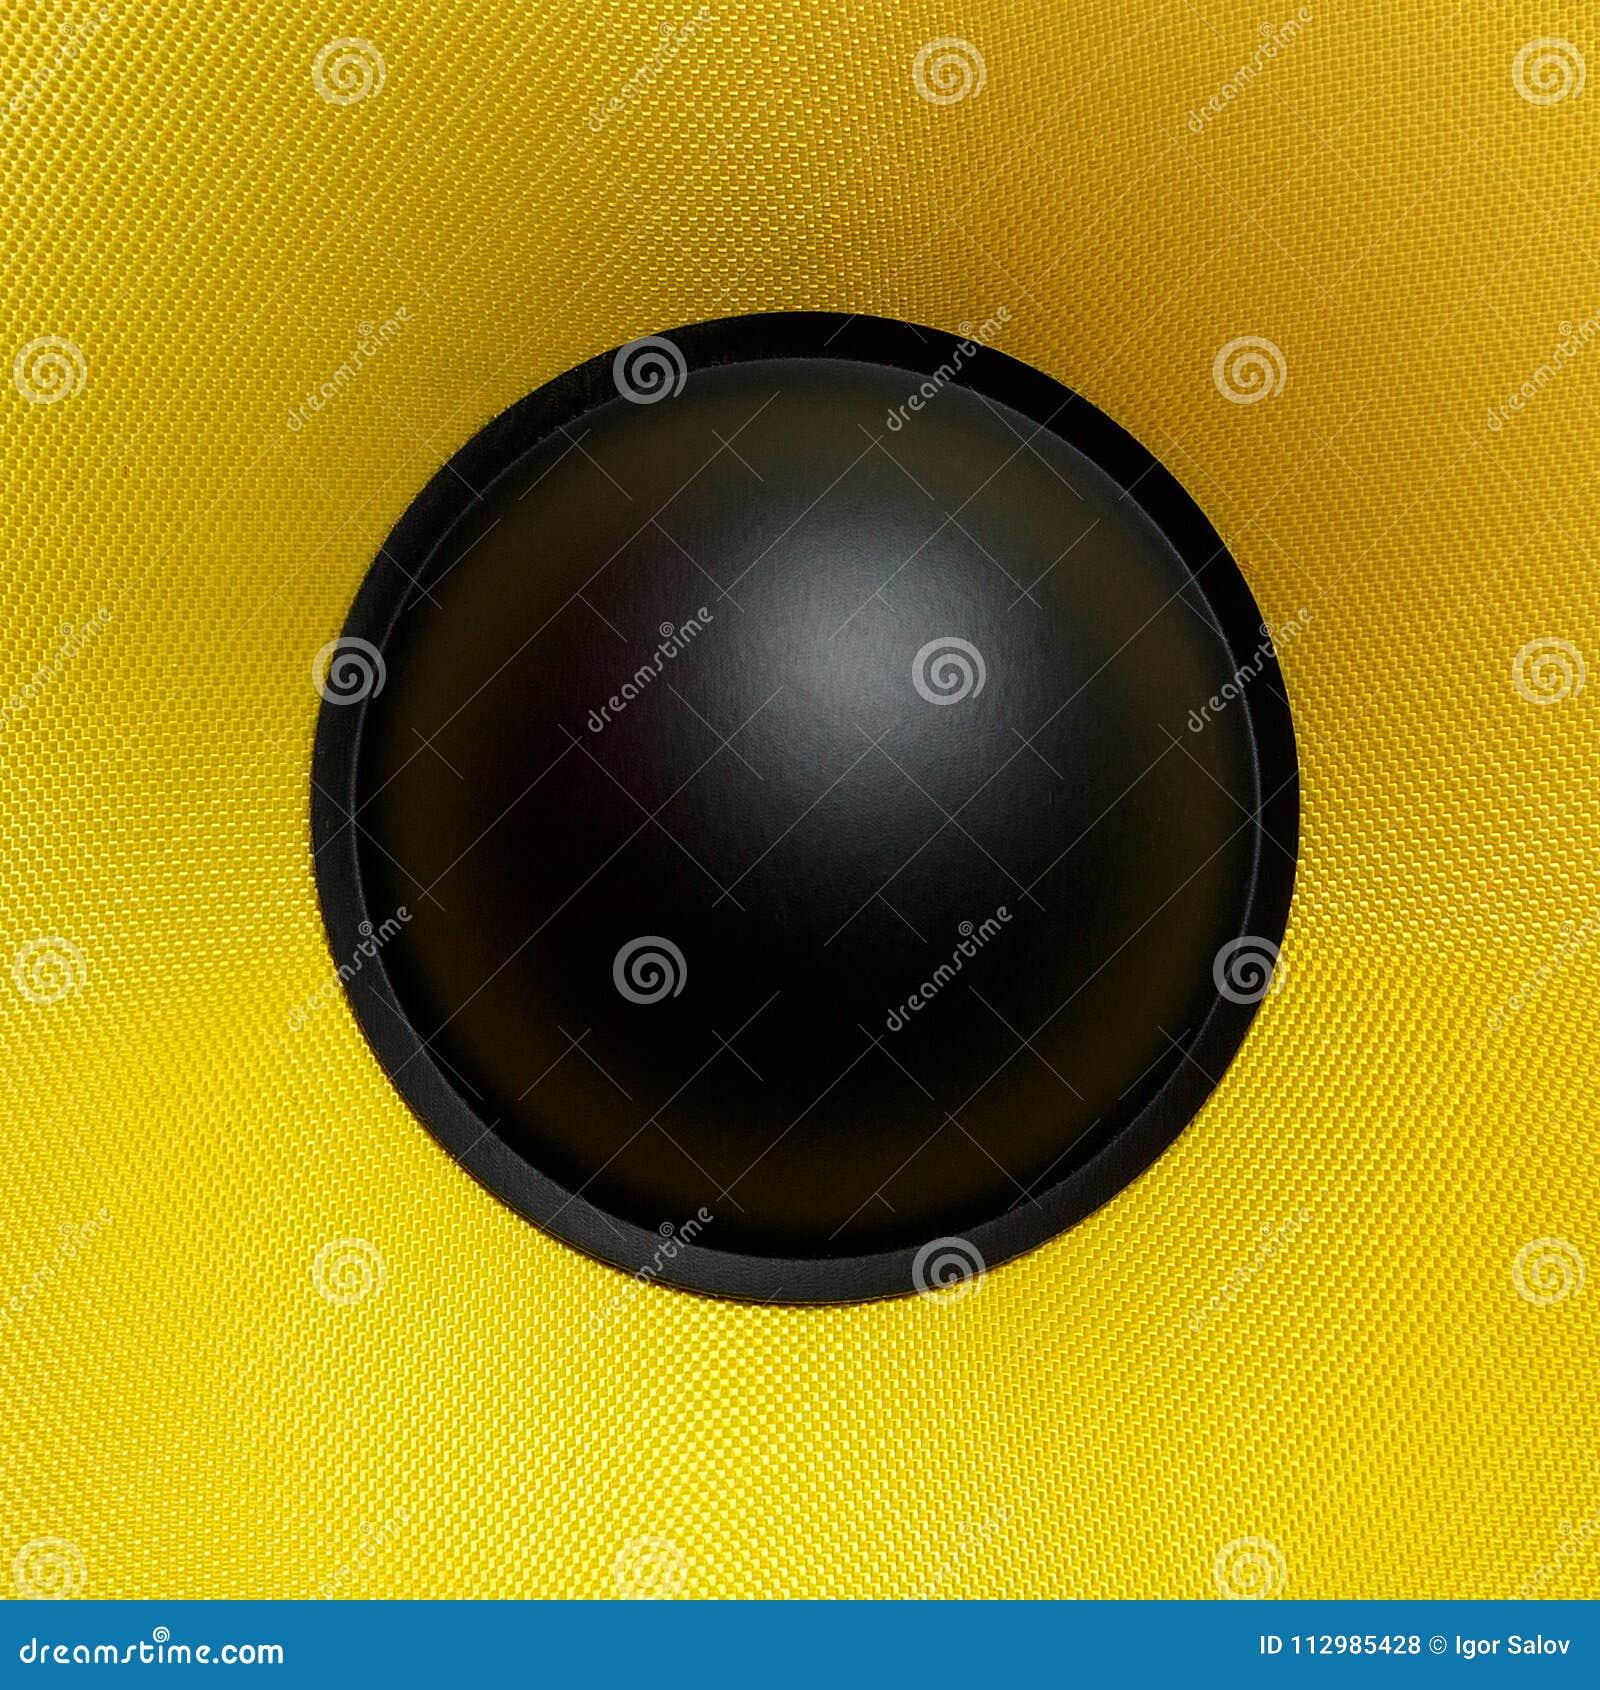 Yellow speaker loudspeaker close-up part of a musical column